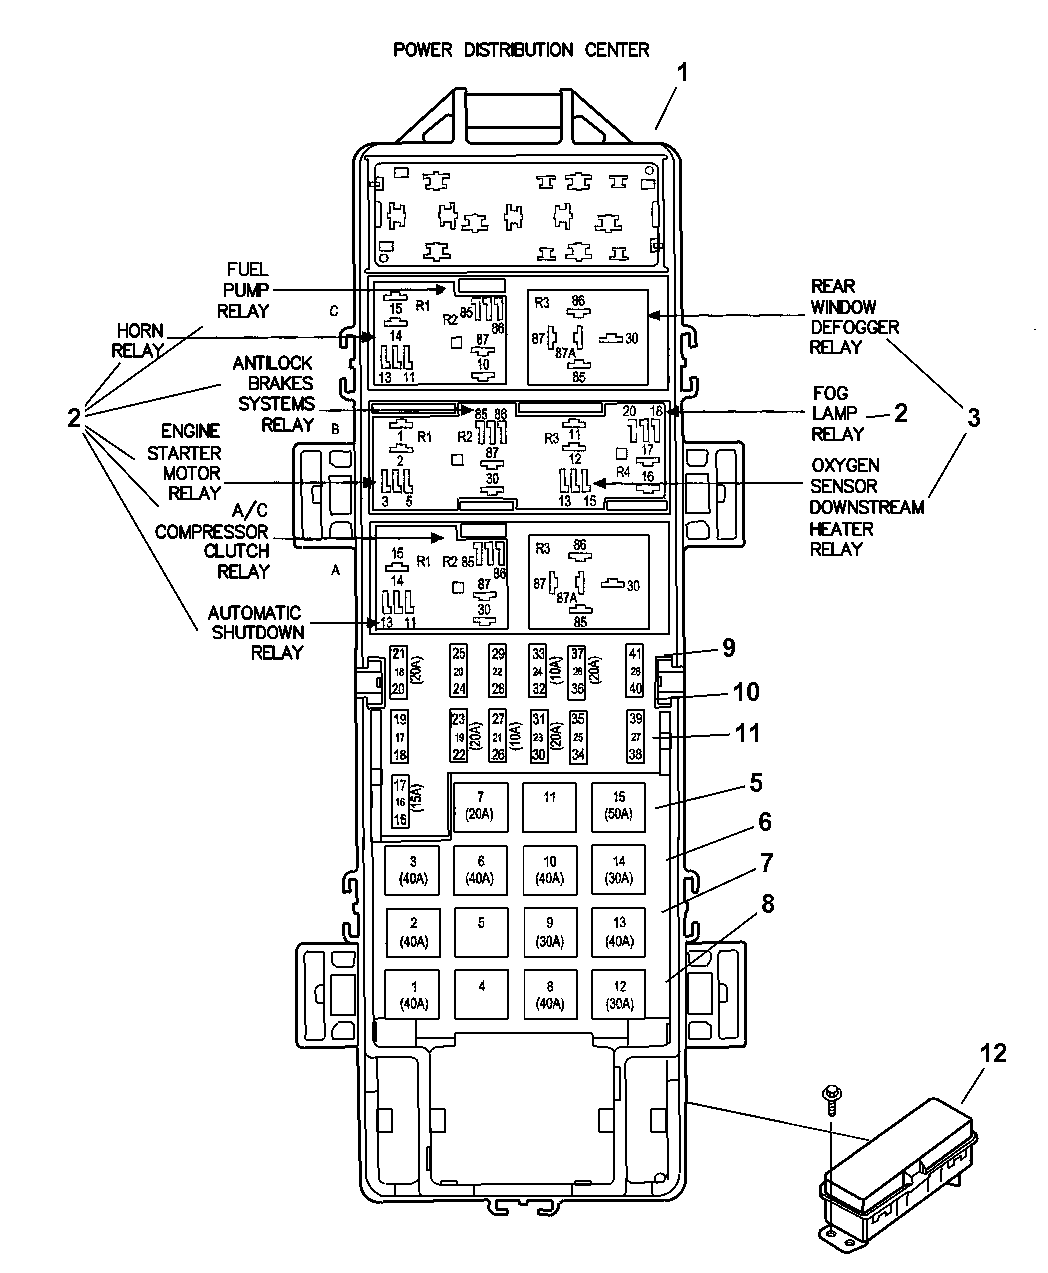 2005 Jeep Wrangler Power Distribution Center Relay & Fuses